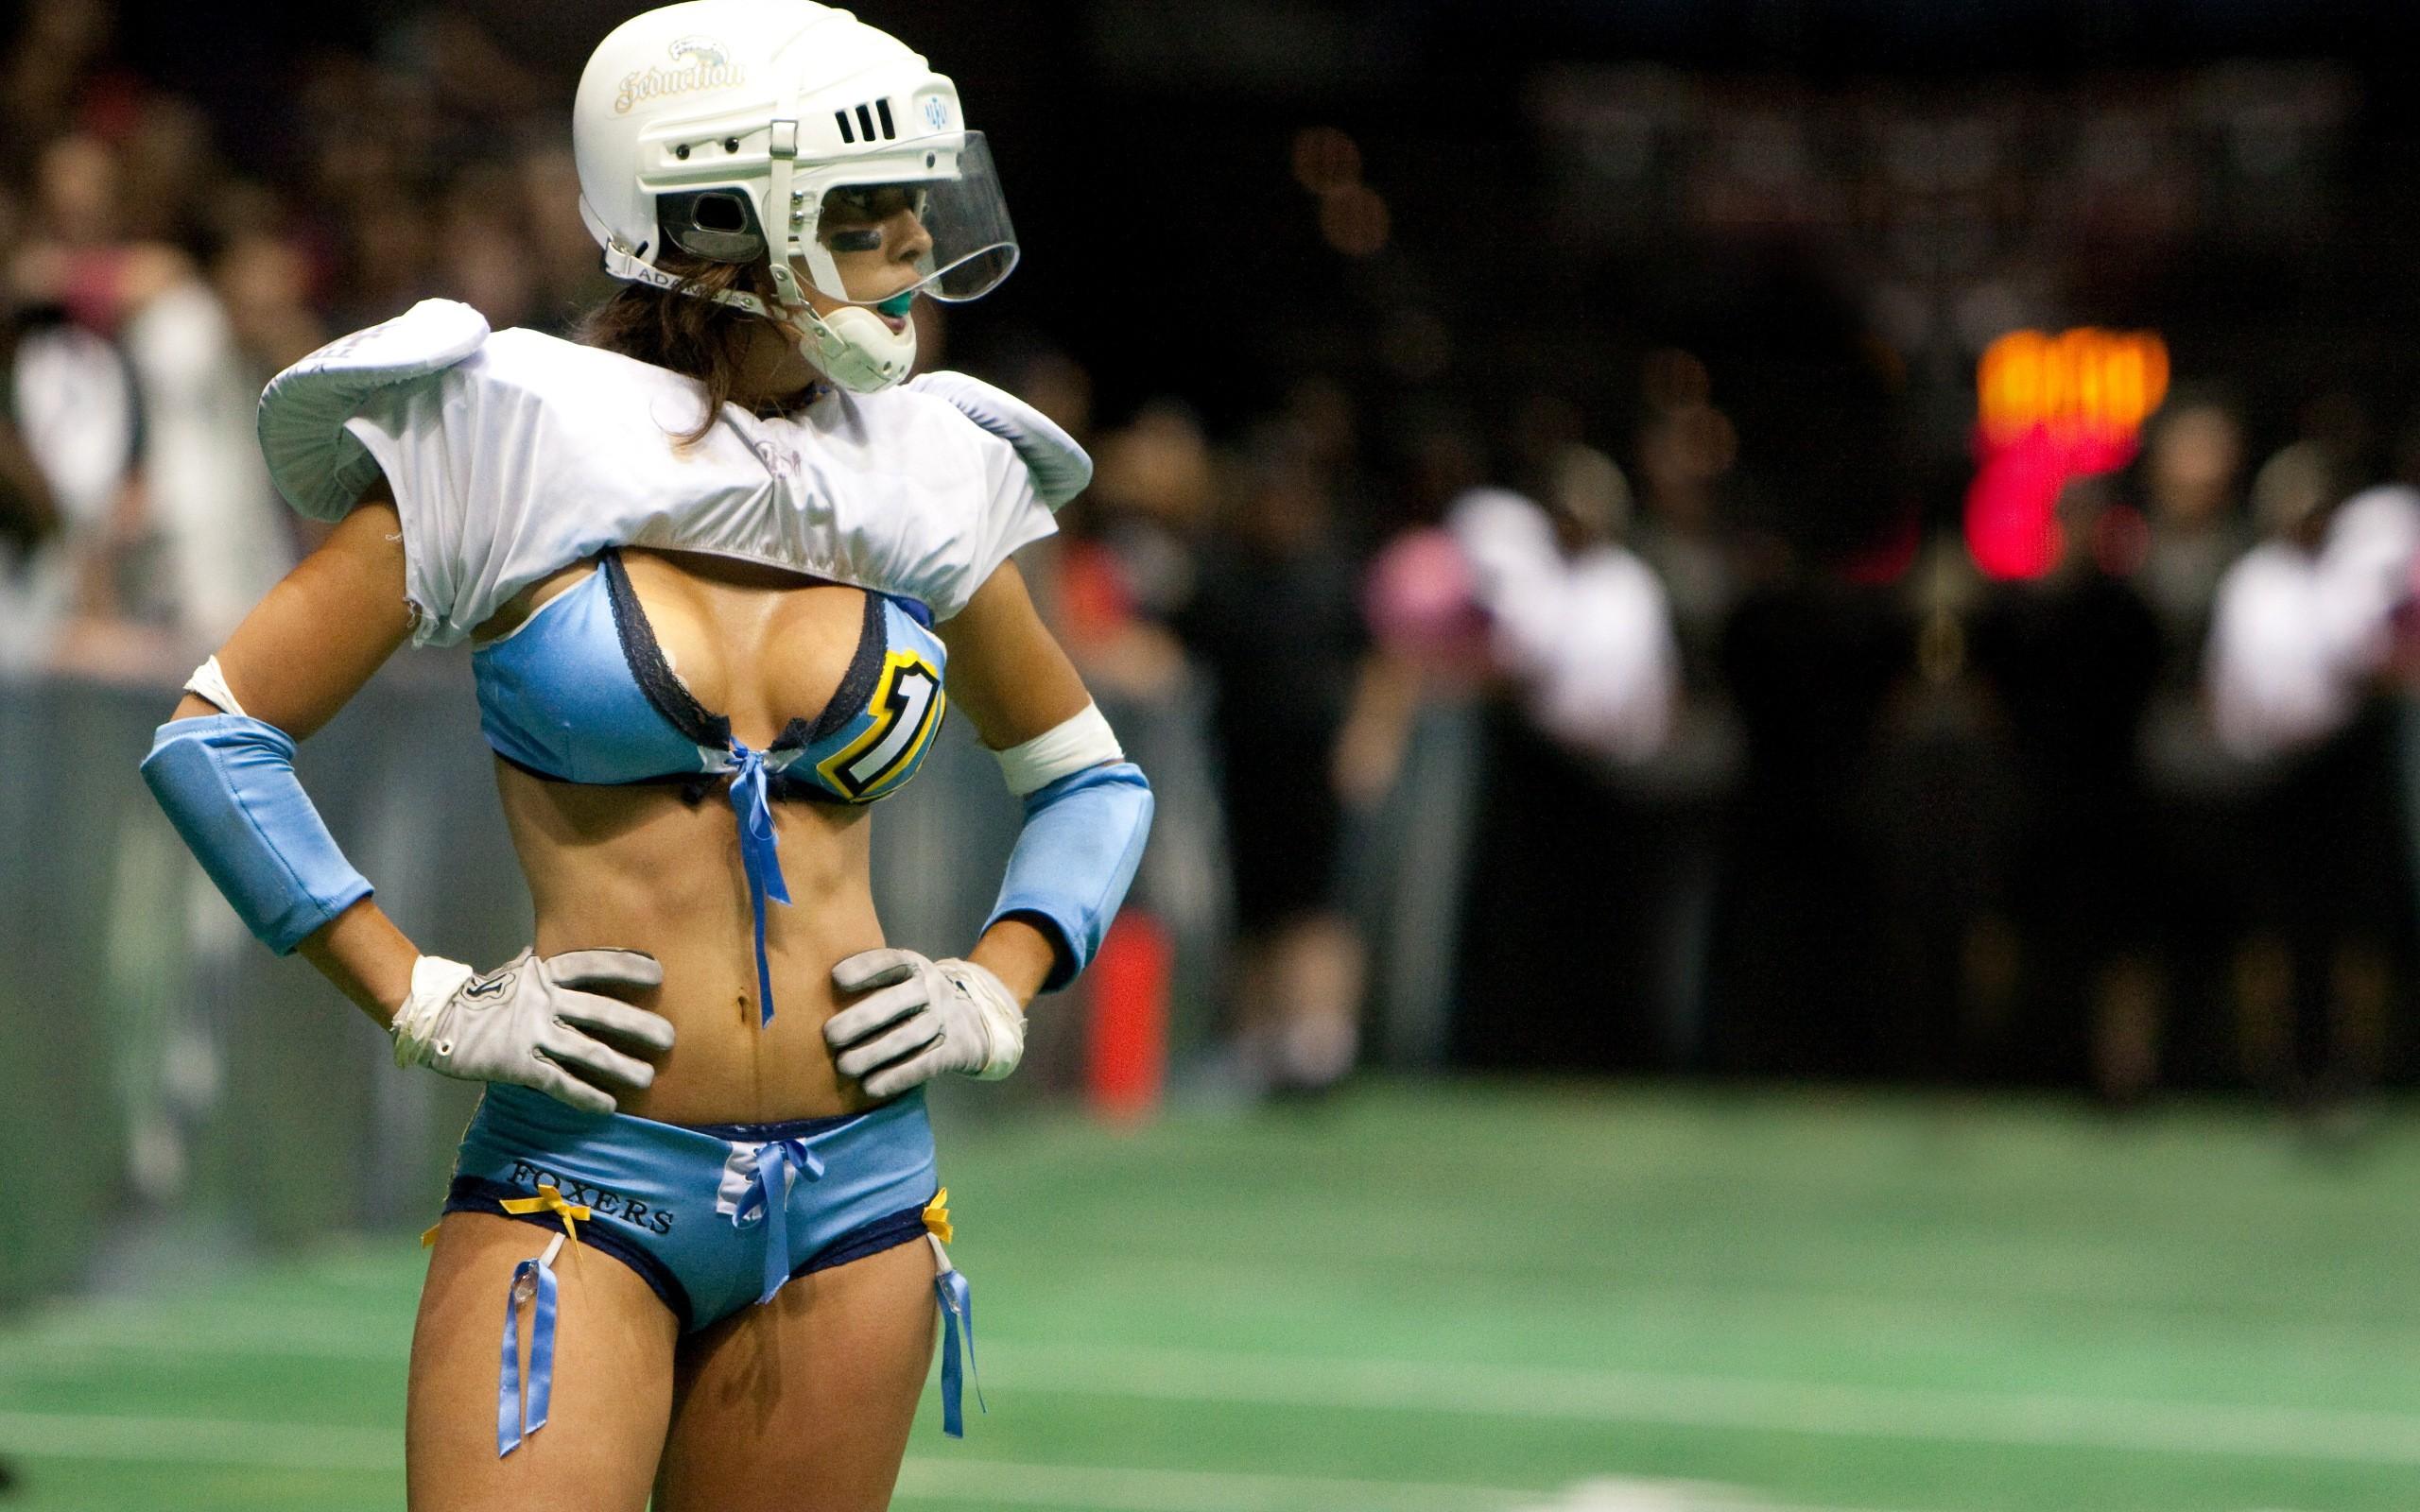 People 2560x1600 American football Lingerie Football League women cleavage lingerie